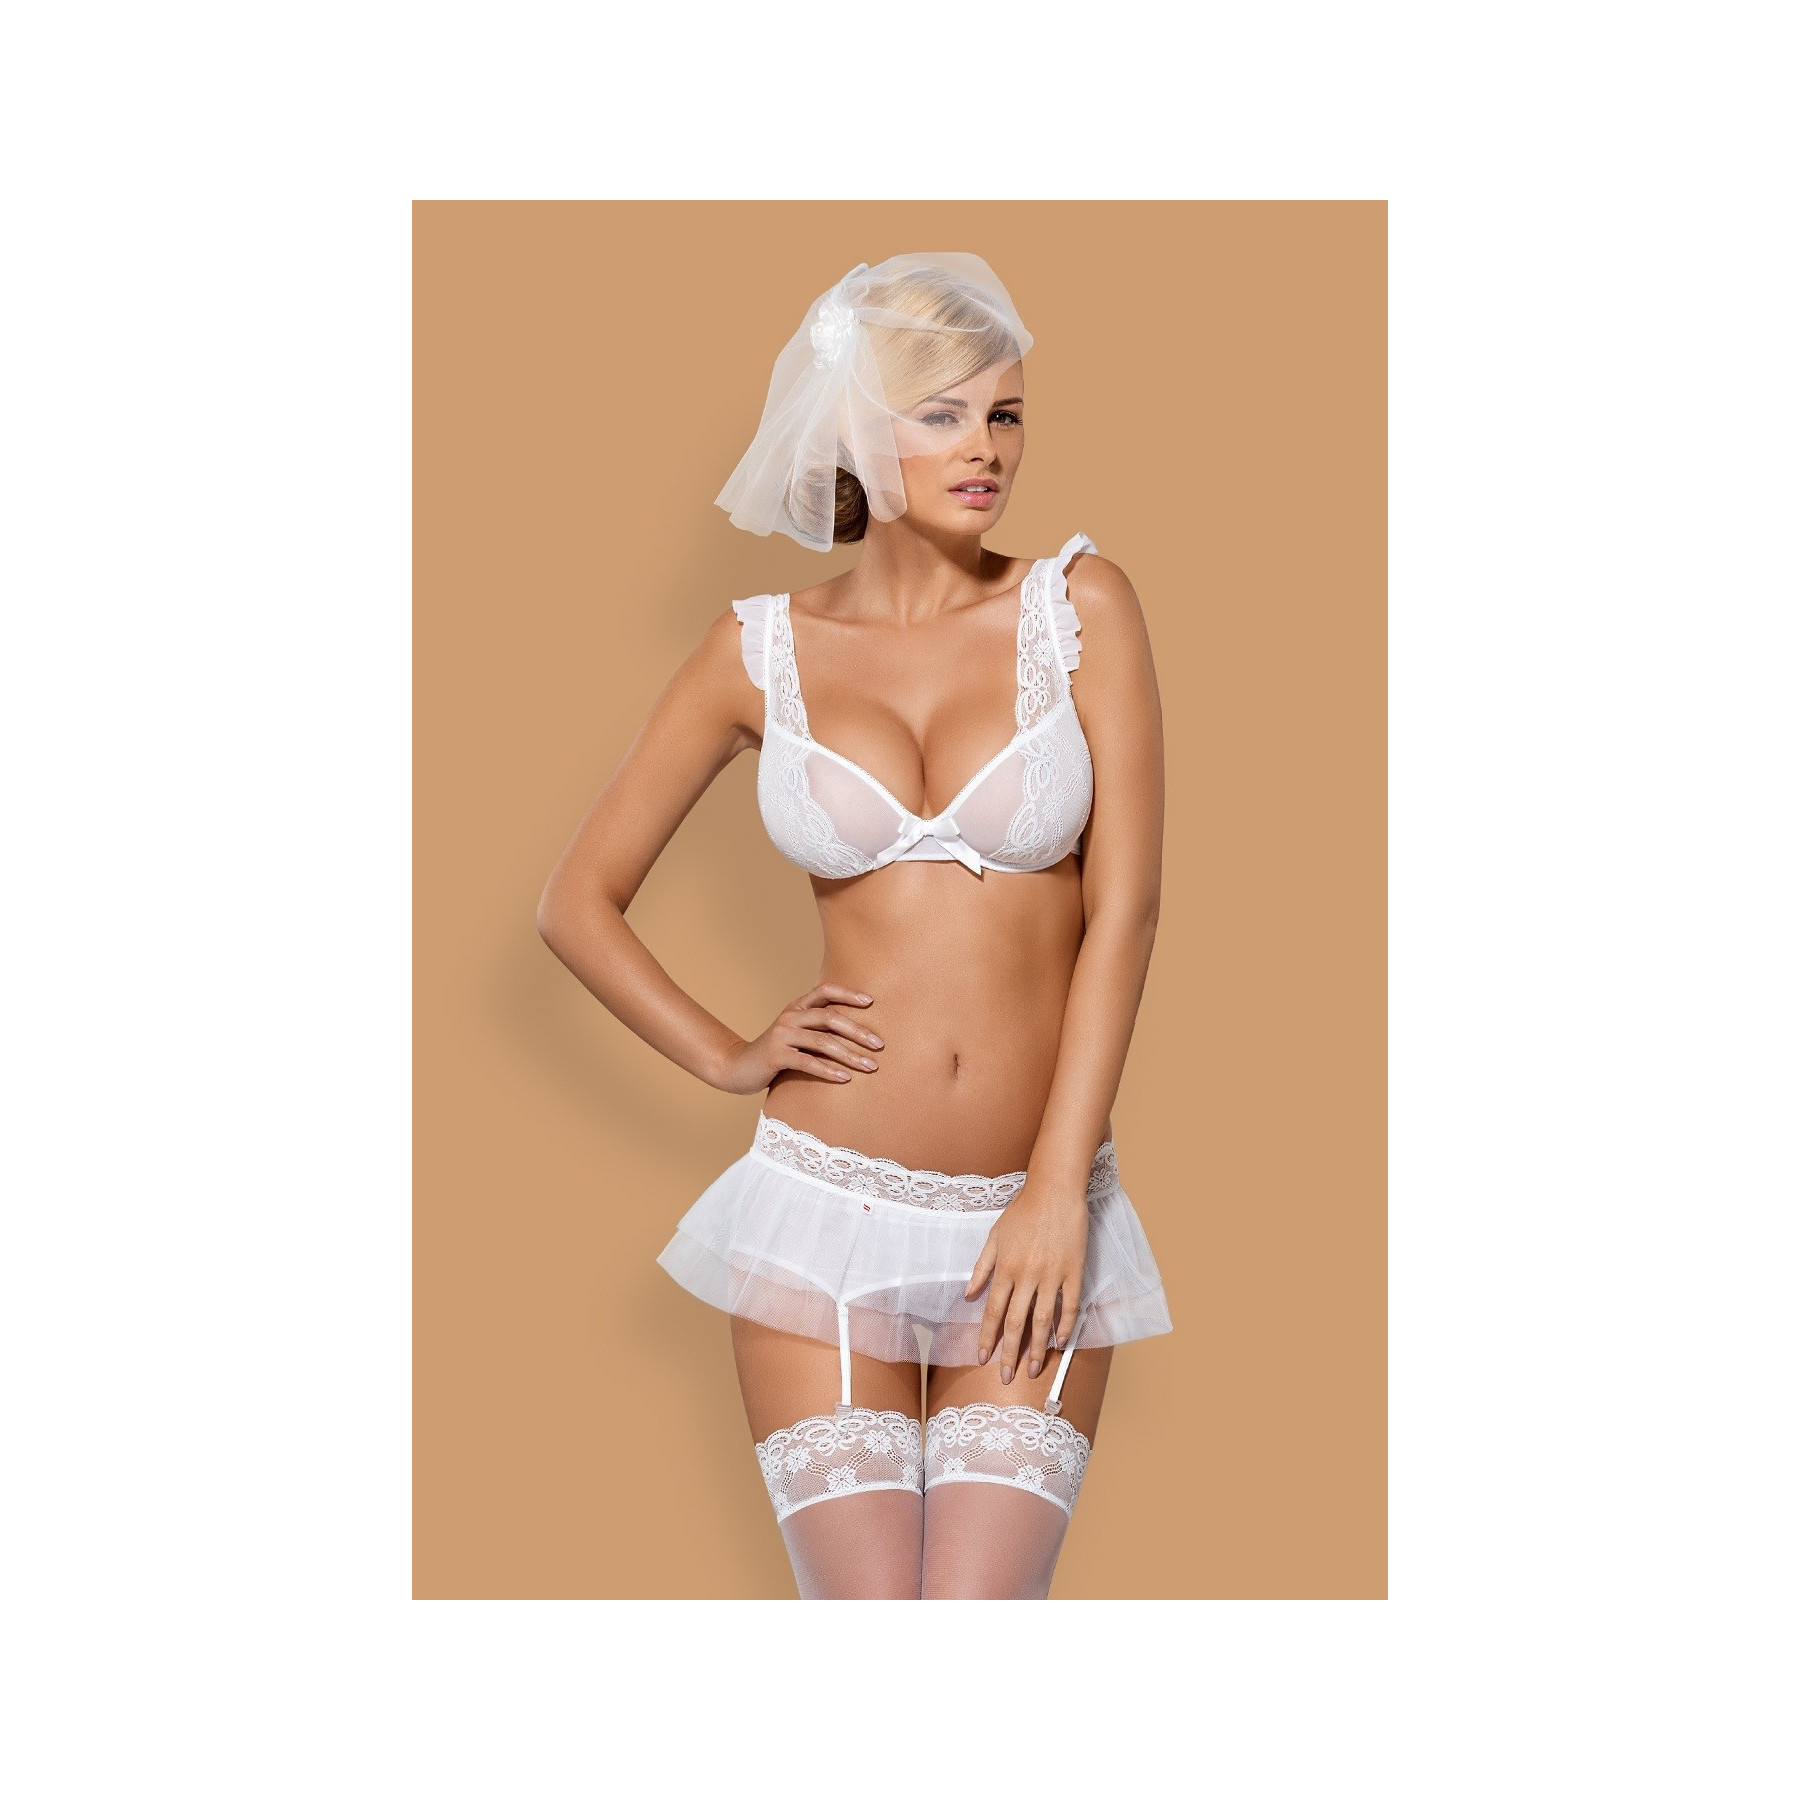 Completino intimo Julitta lingerie sposa sexy Obsessive